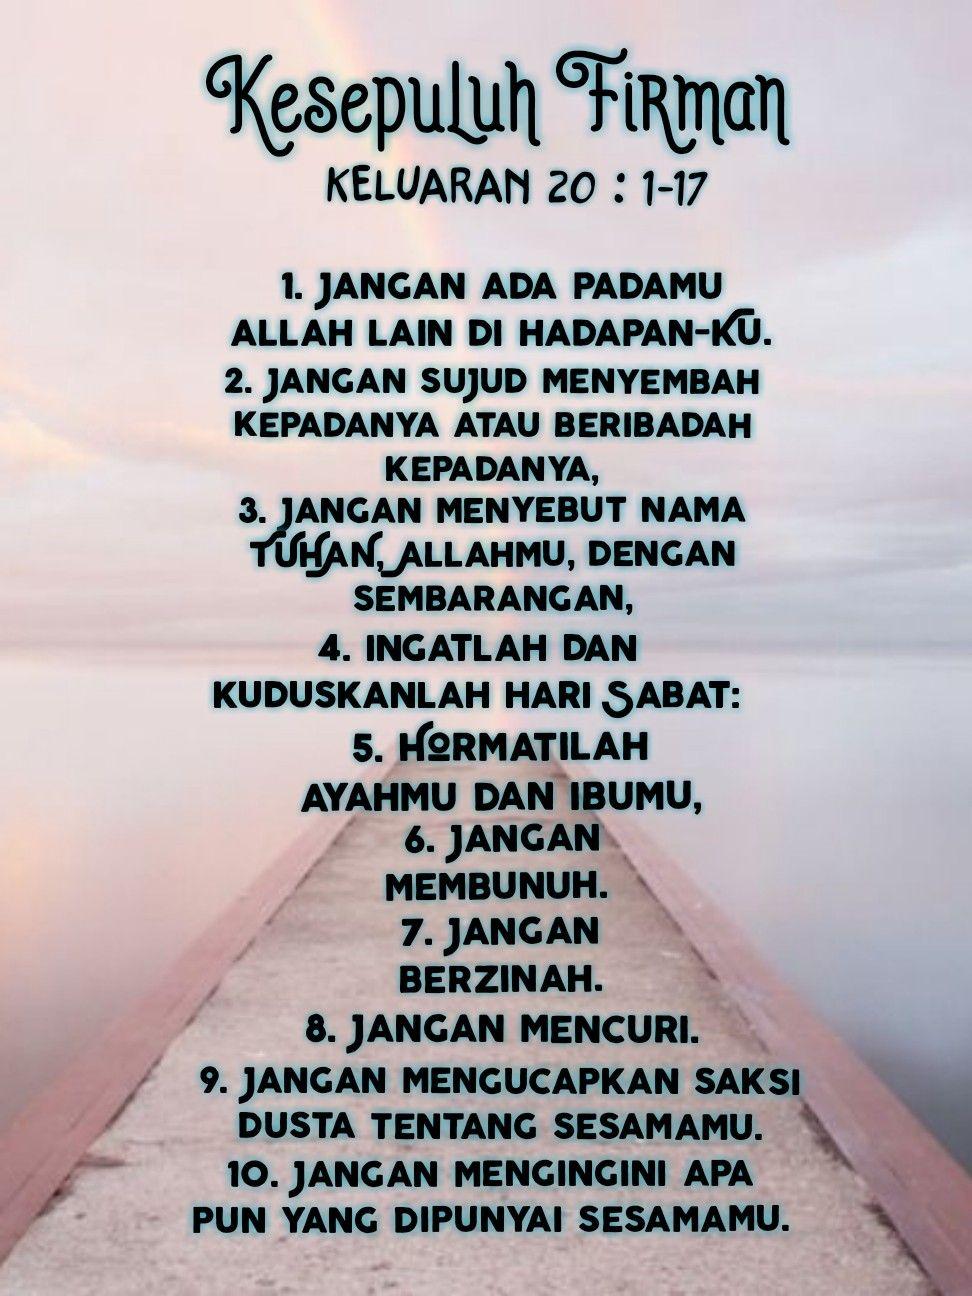 Kesepuluh Firman Keluaran 20 1 17 Ayat Alkitab Kutipan Alkitab Alkitab